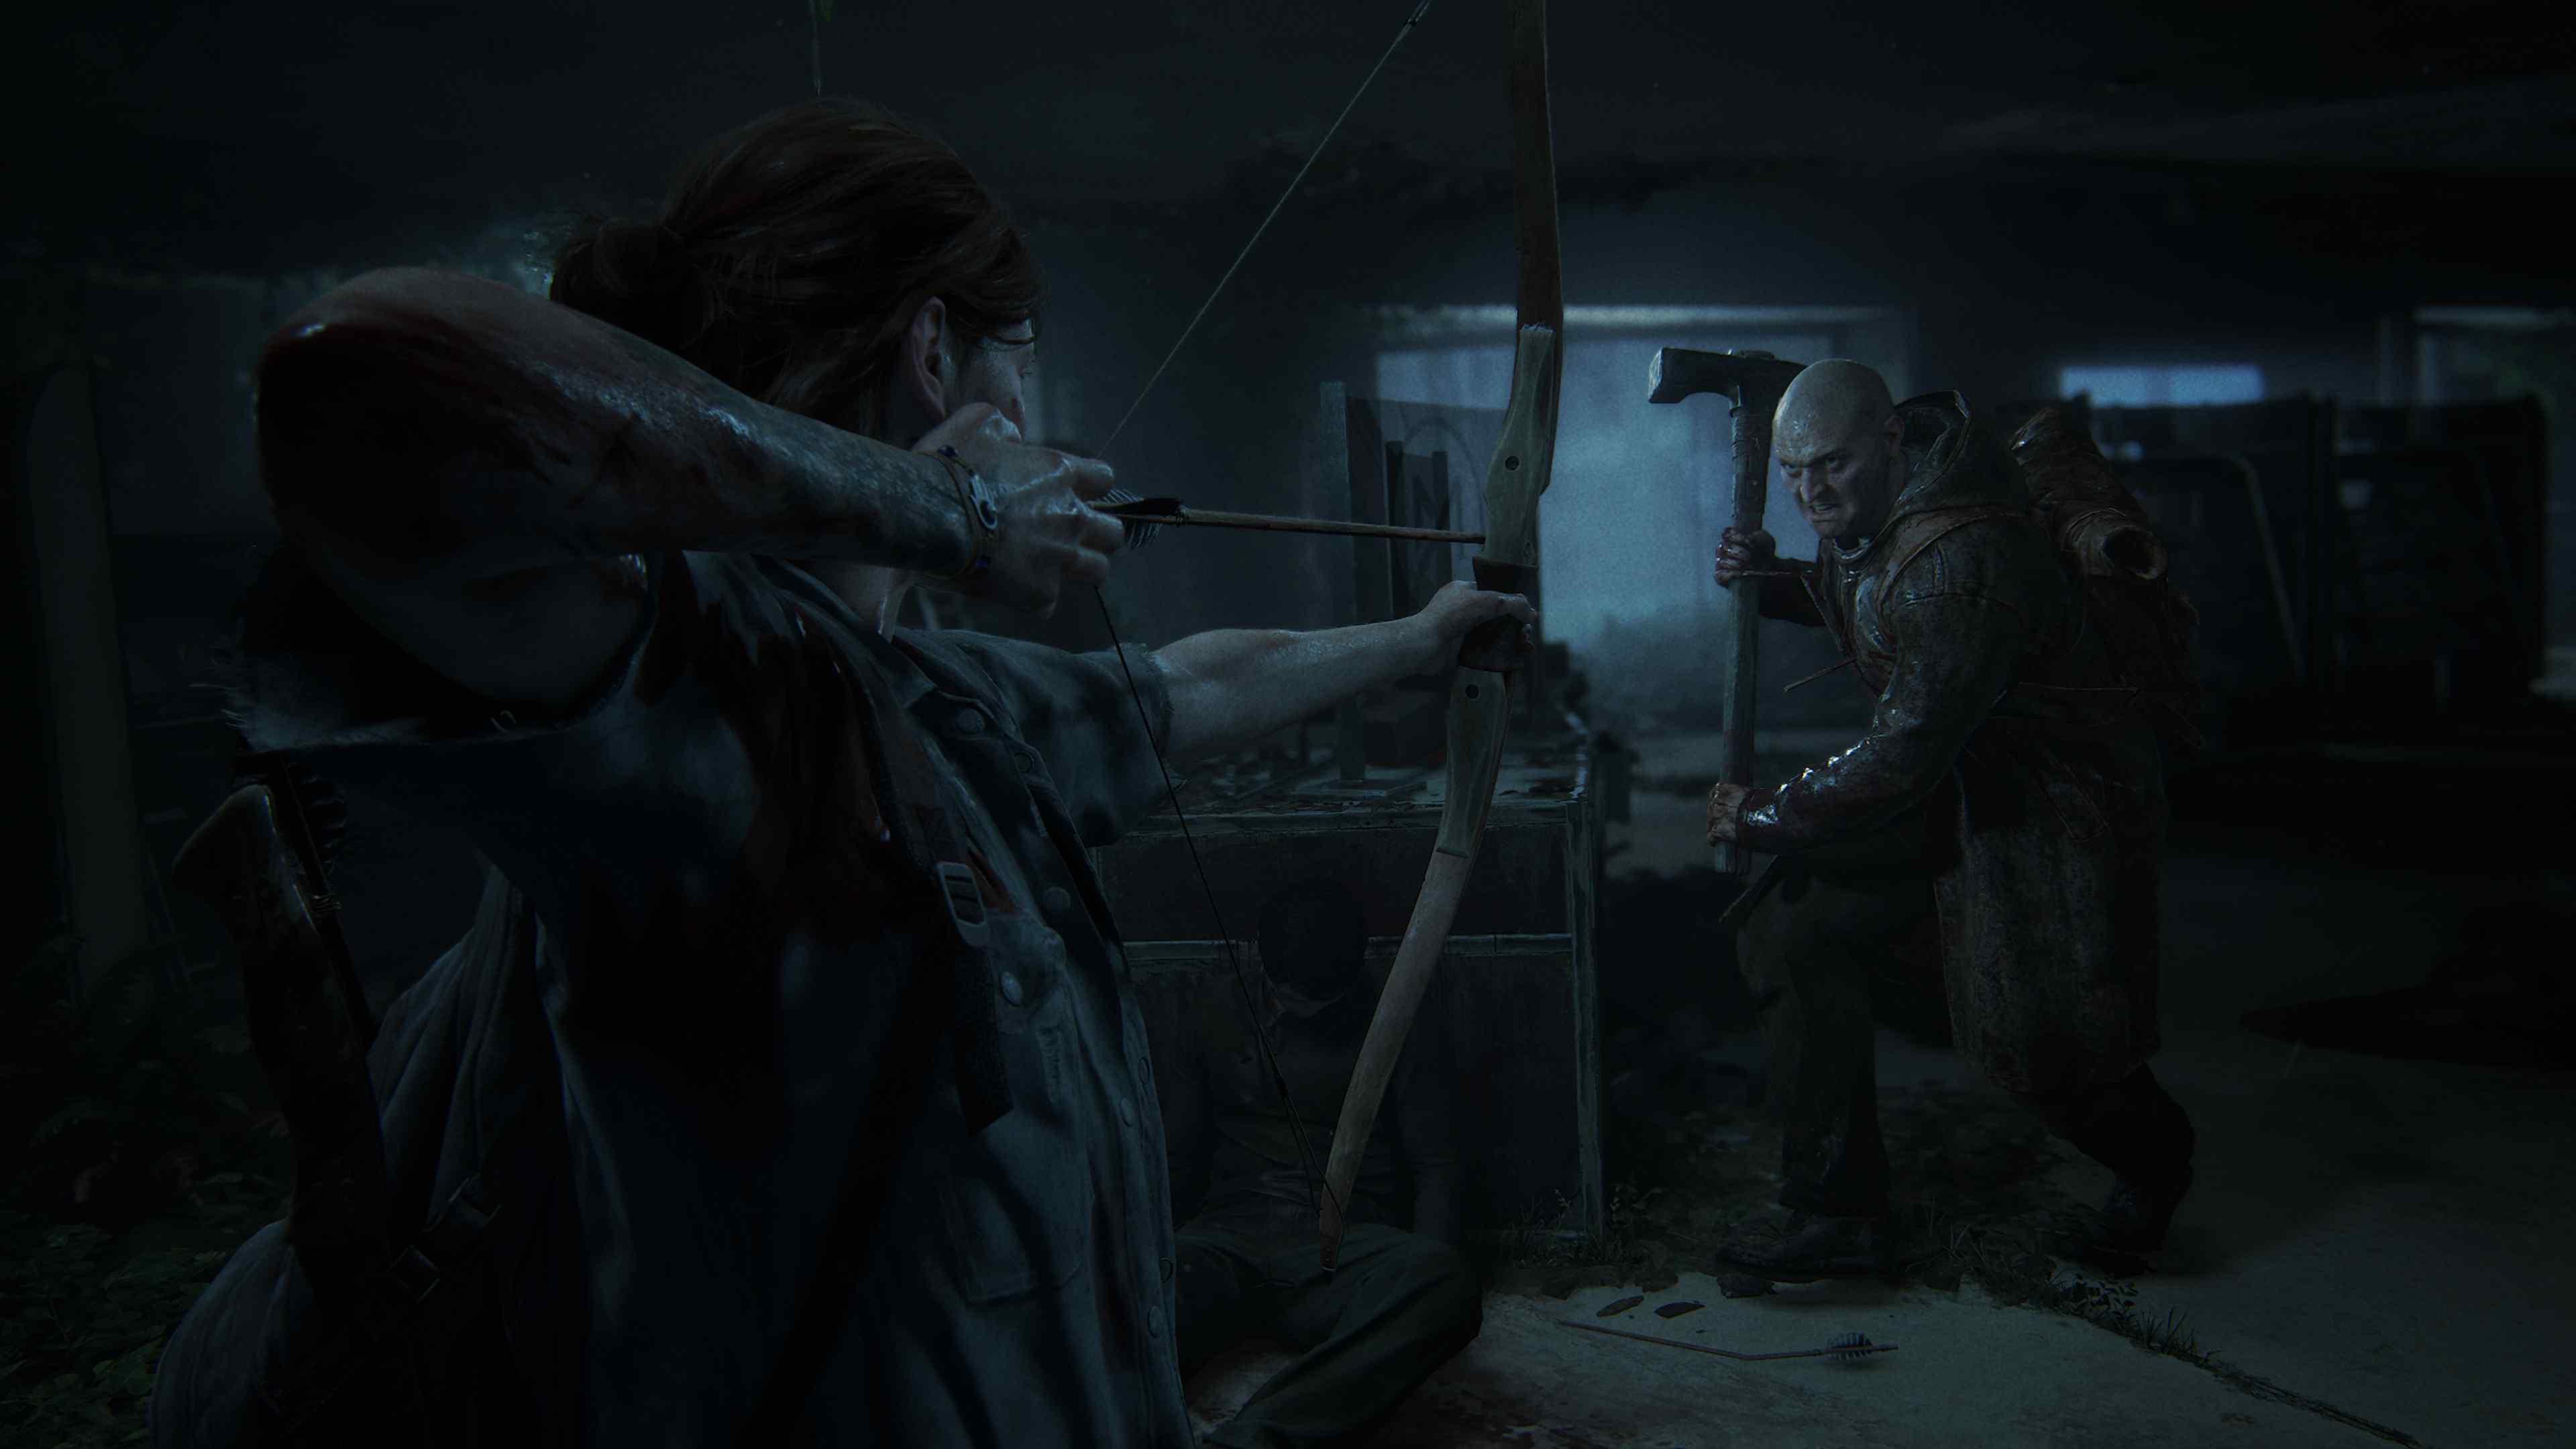 The Last of Us: Part II Screenshot 2